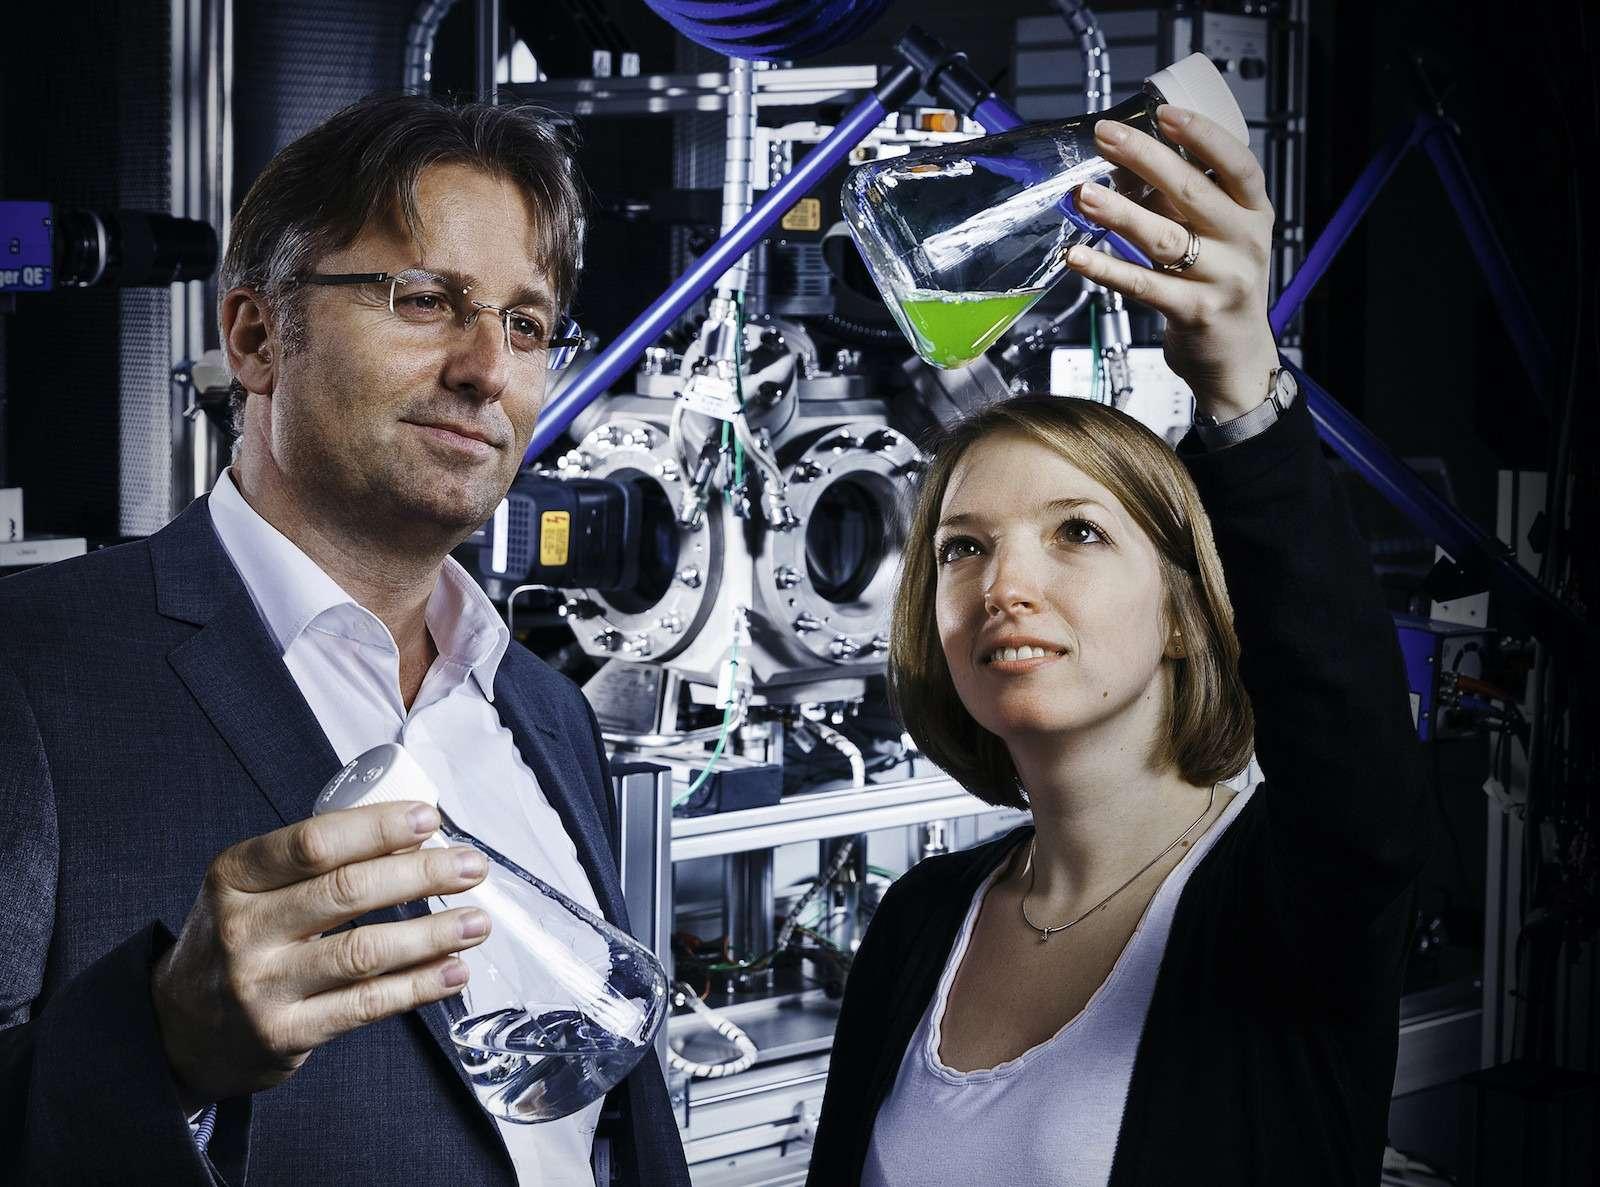 Encounter— The Audi Technology Magazine 1/2014